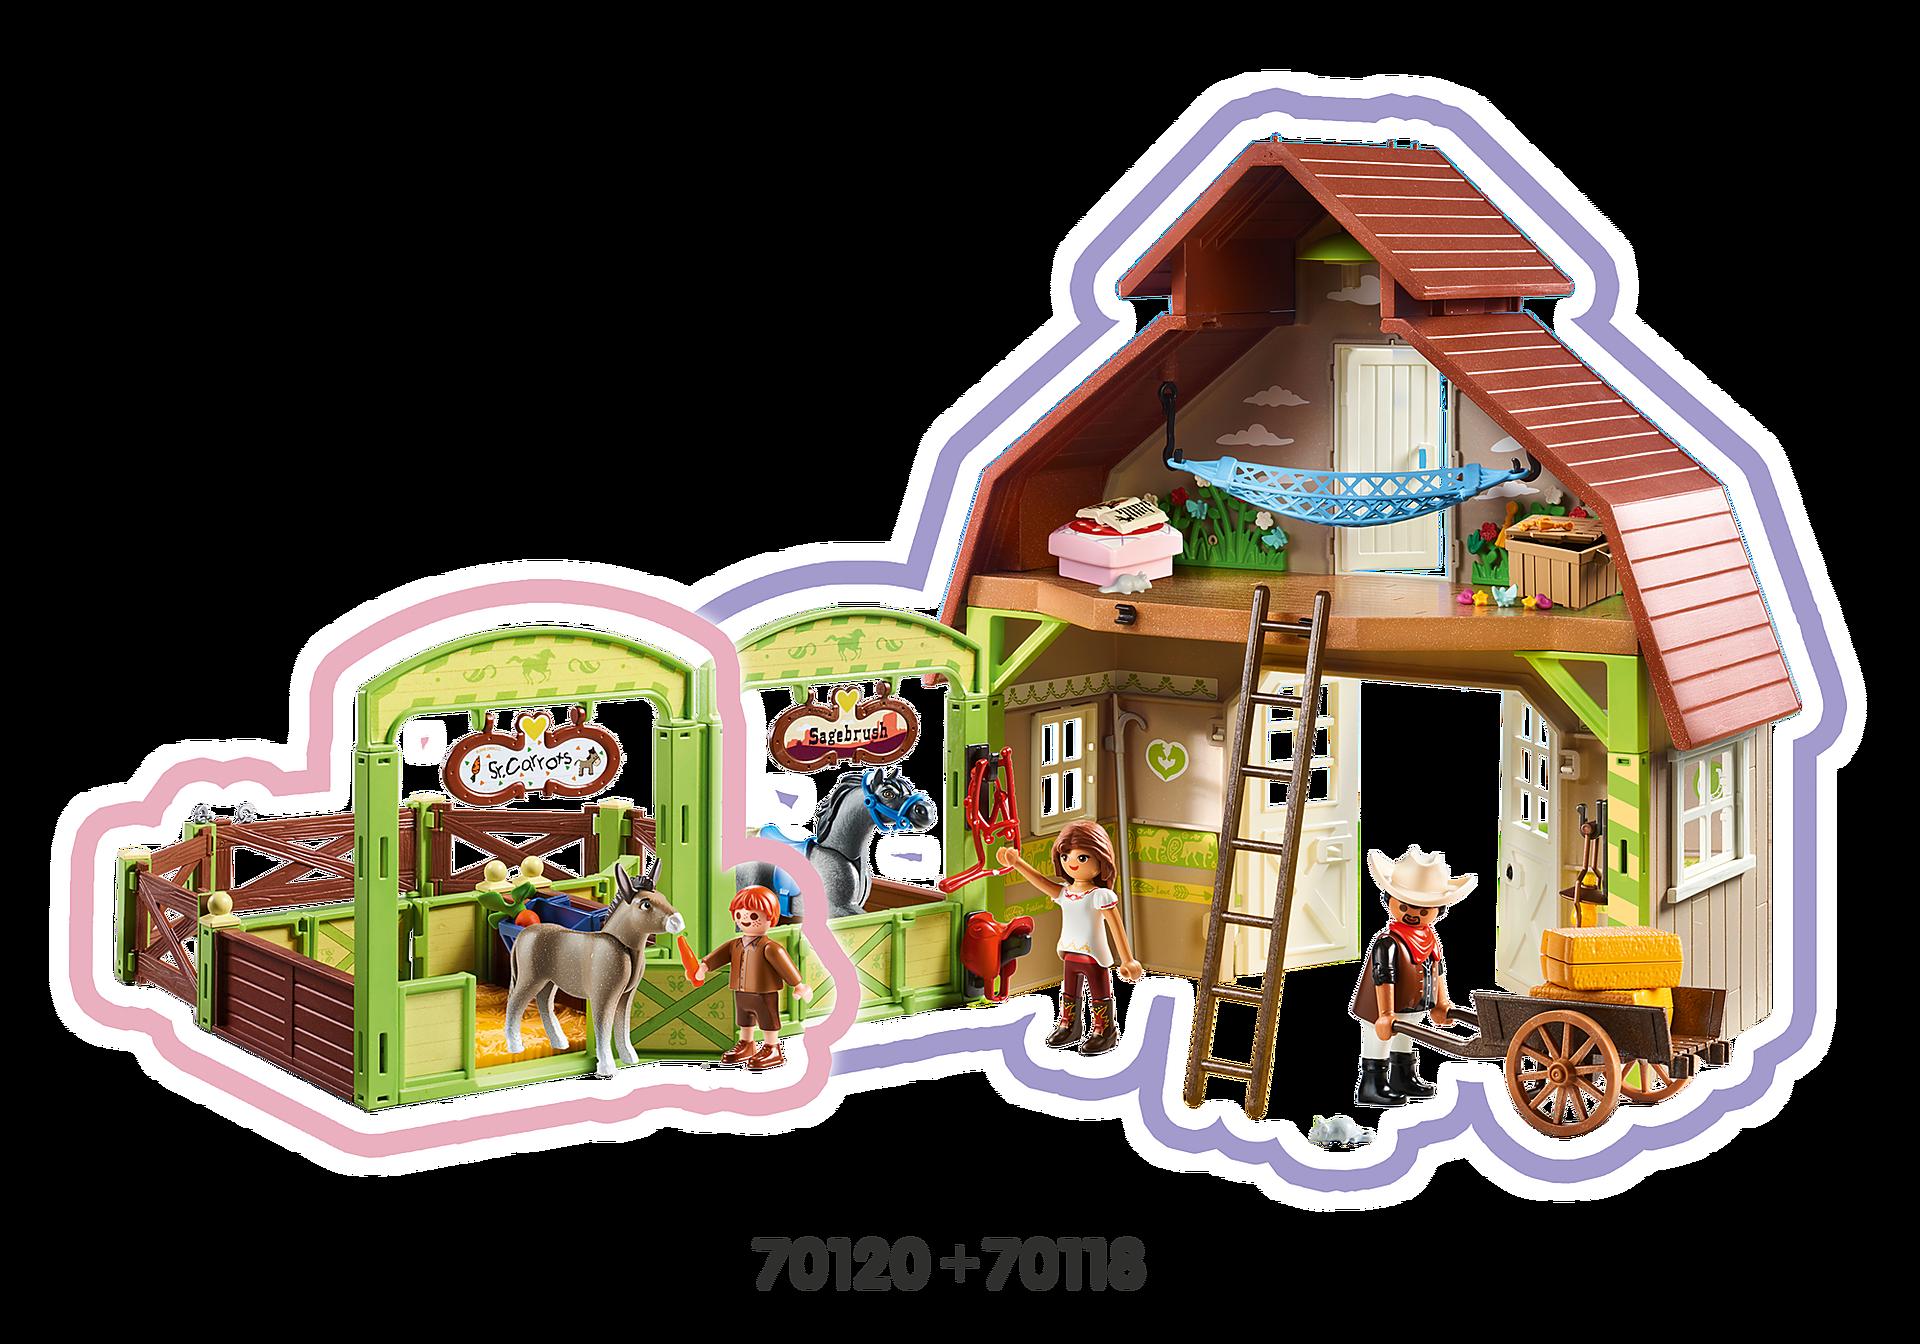 http://media.playmobil.com/i/playmobil/70120_product_extra2/Knip en Meneer Worteltjes met paardenbox